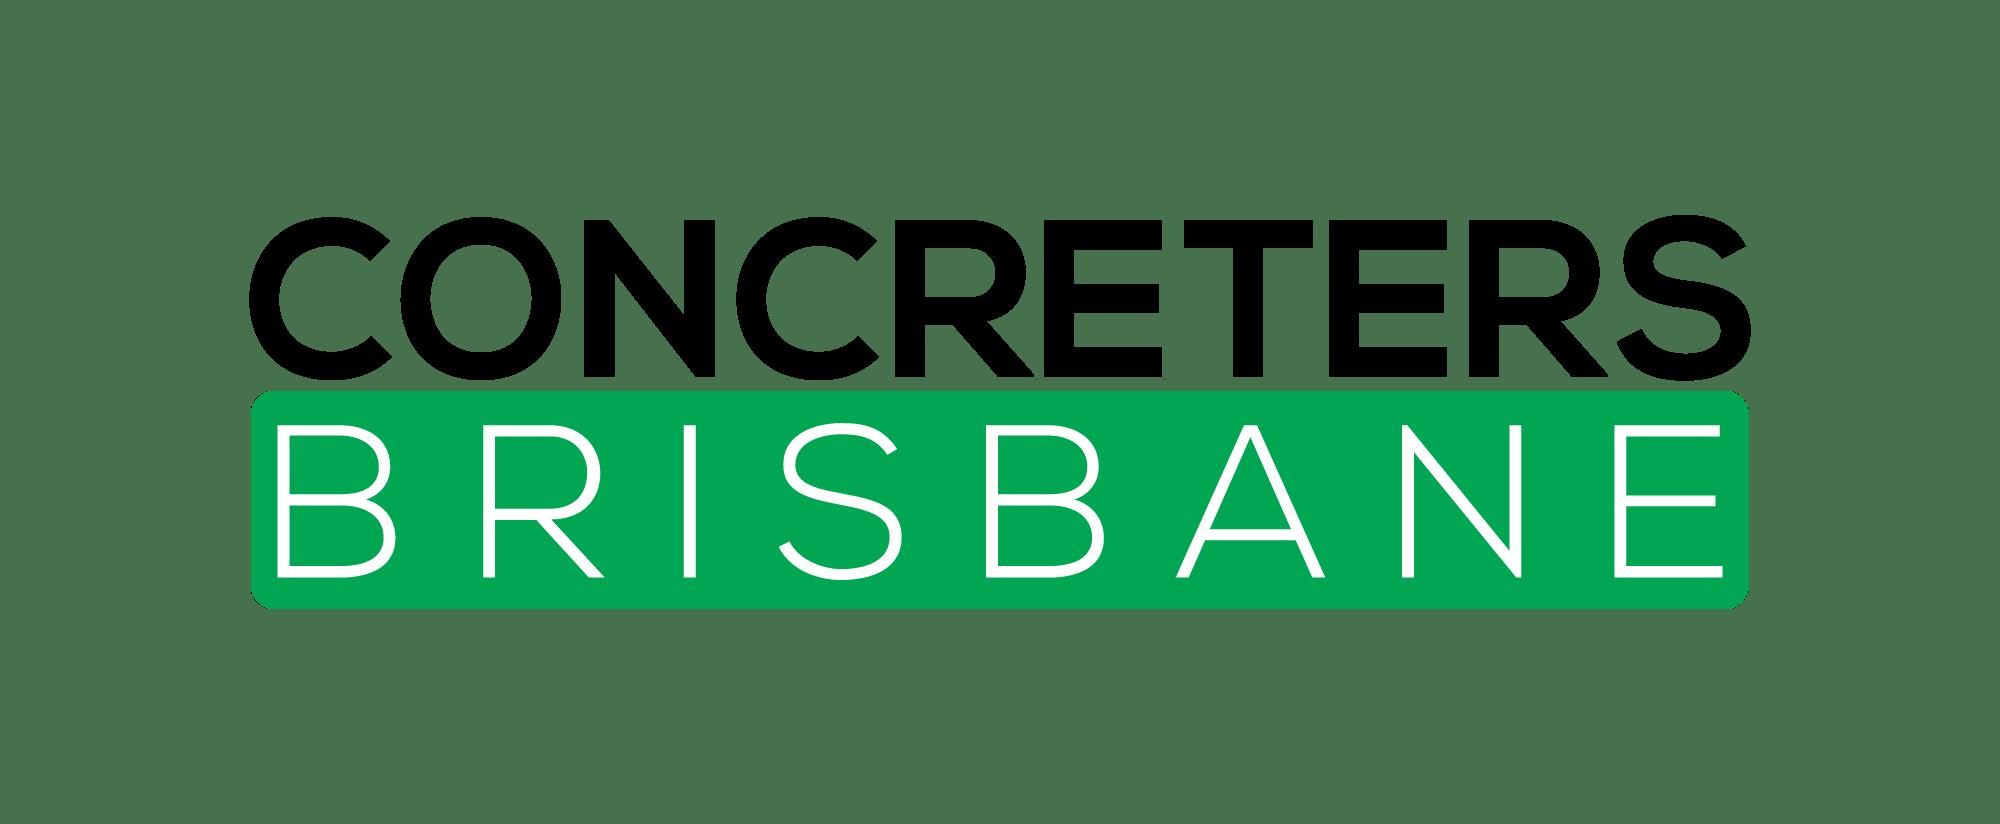 concreters brisbane logo